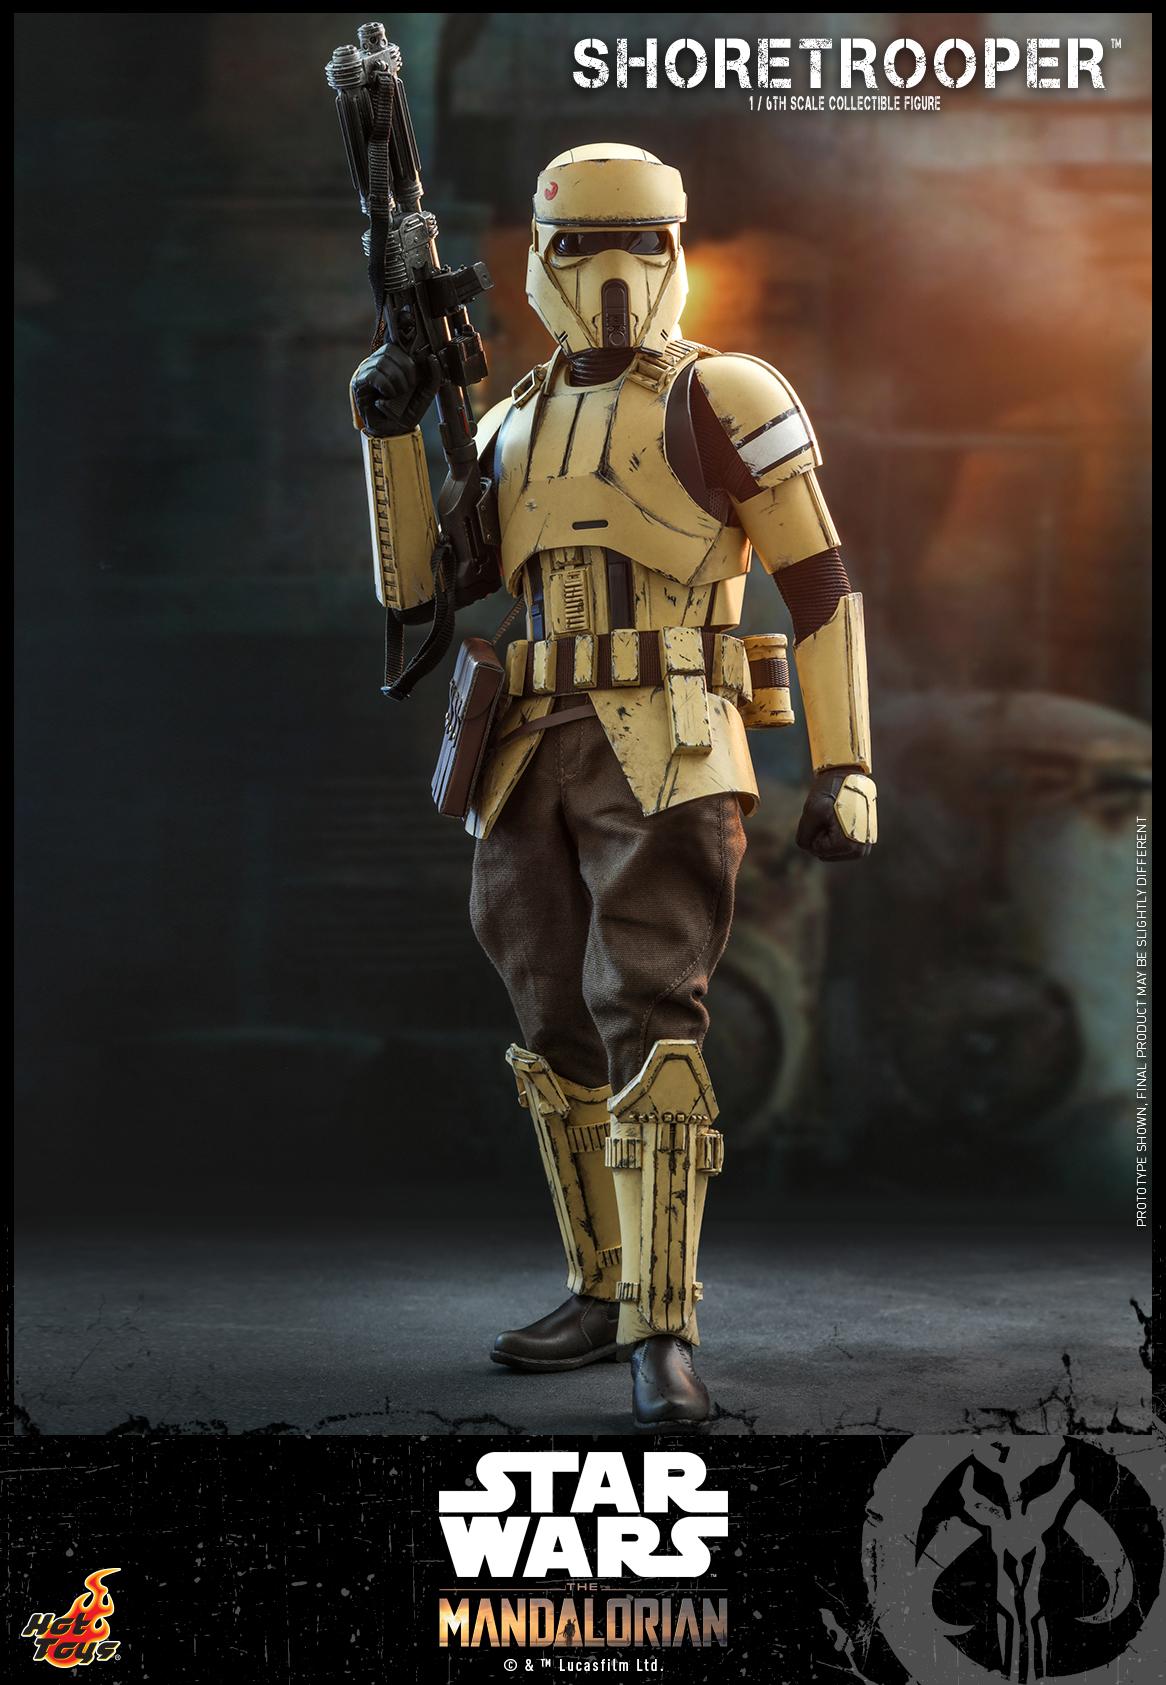 Hot Toys - Mandalorian - Shoretrooper collectible figure_PR1